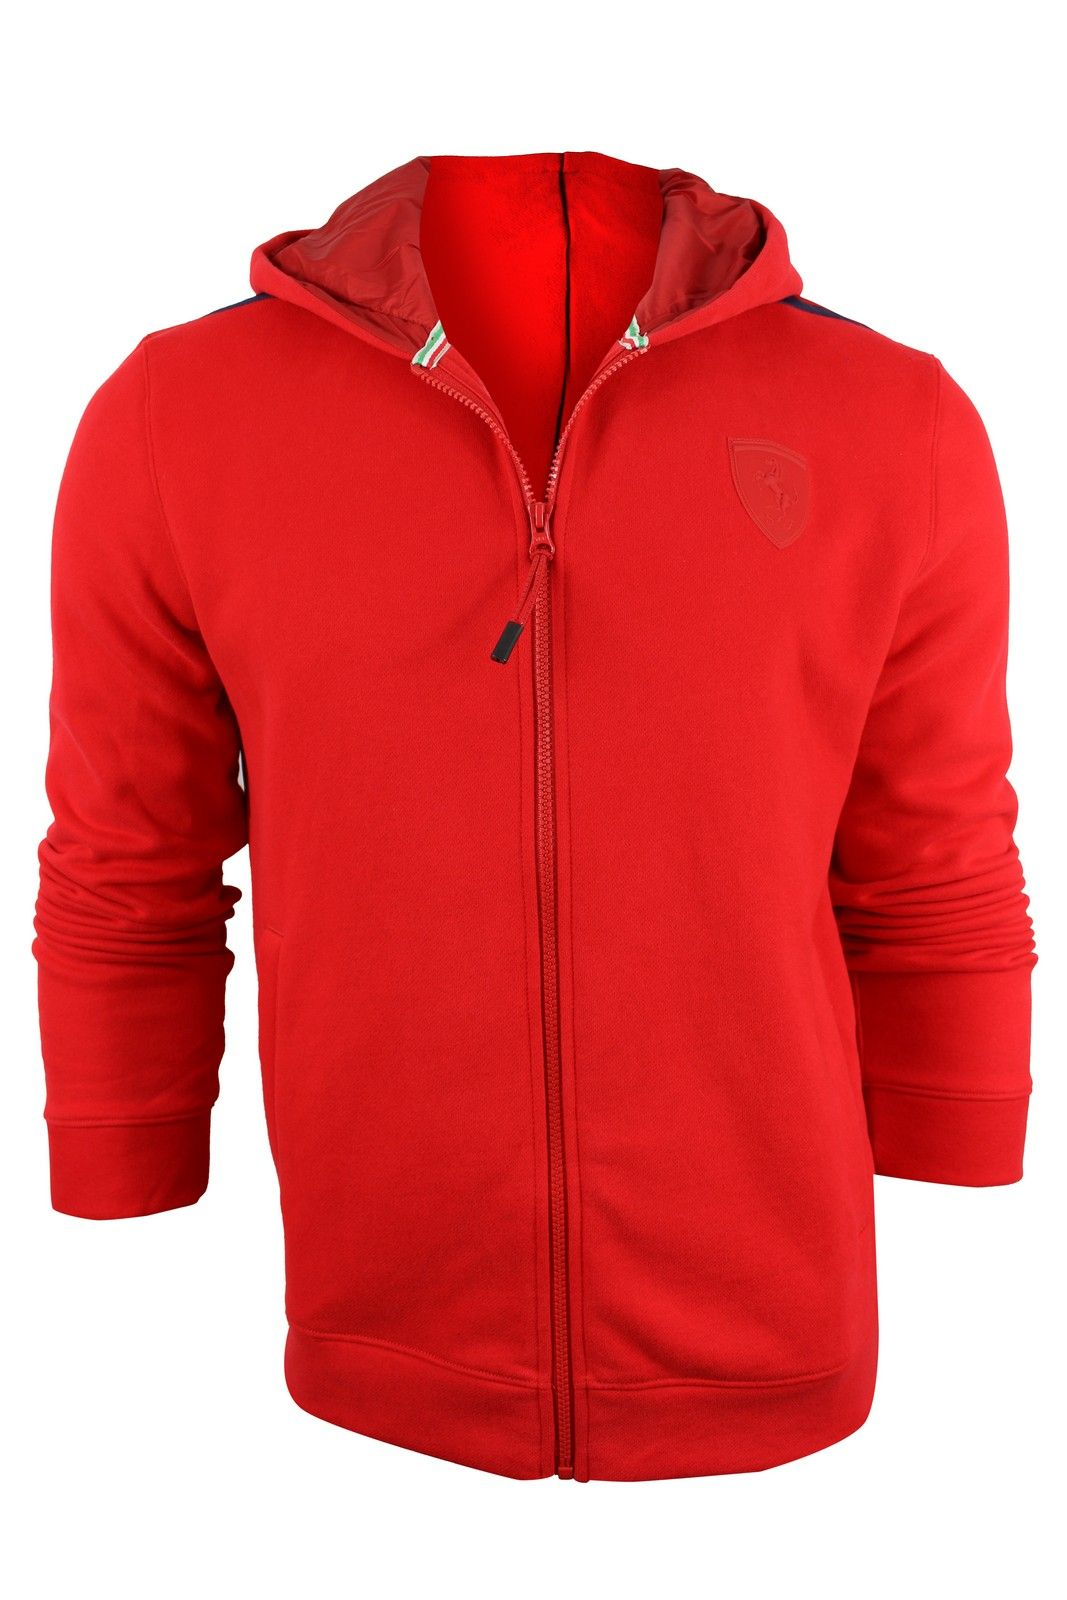 Puma Men s Red Ferrari Hooded Sweat Jacket  1968cb737